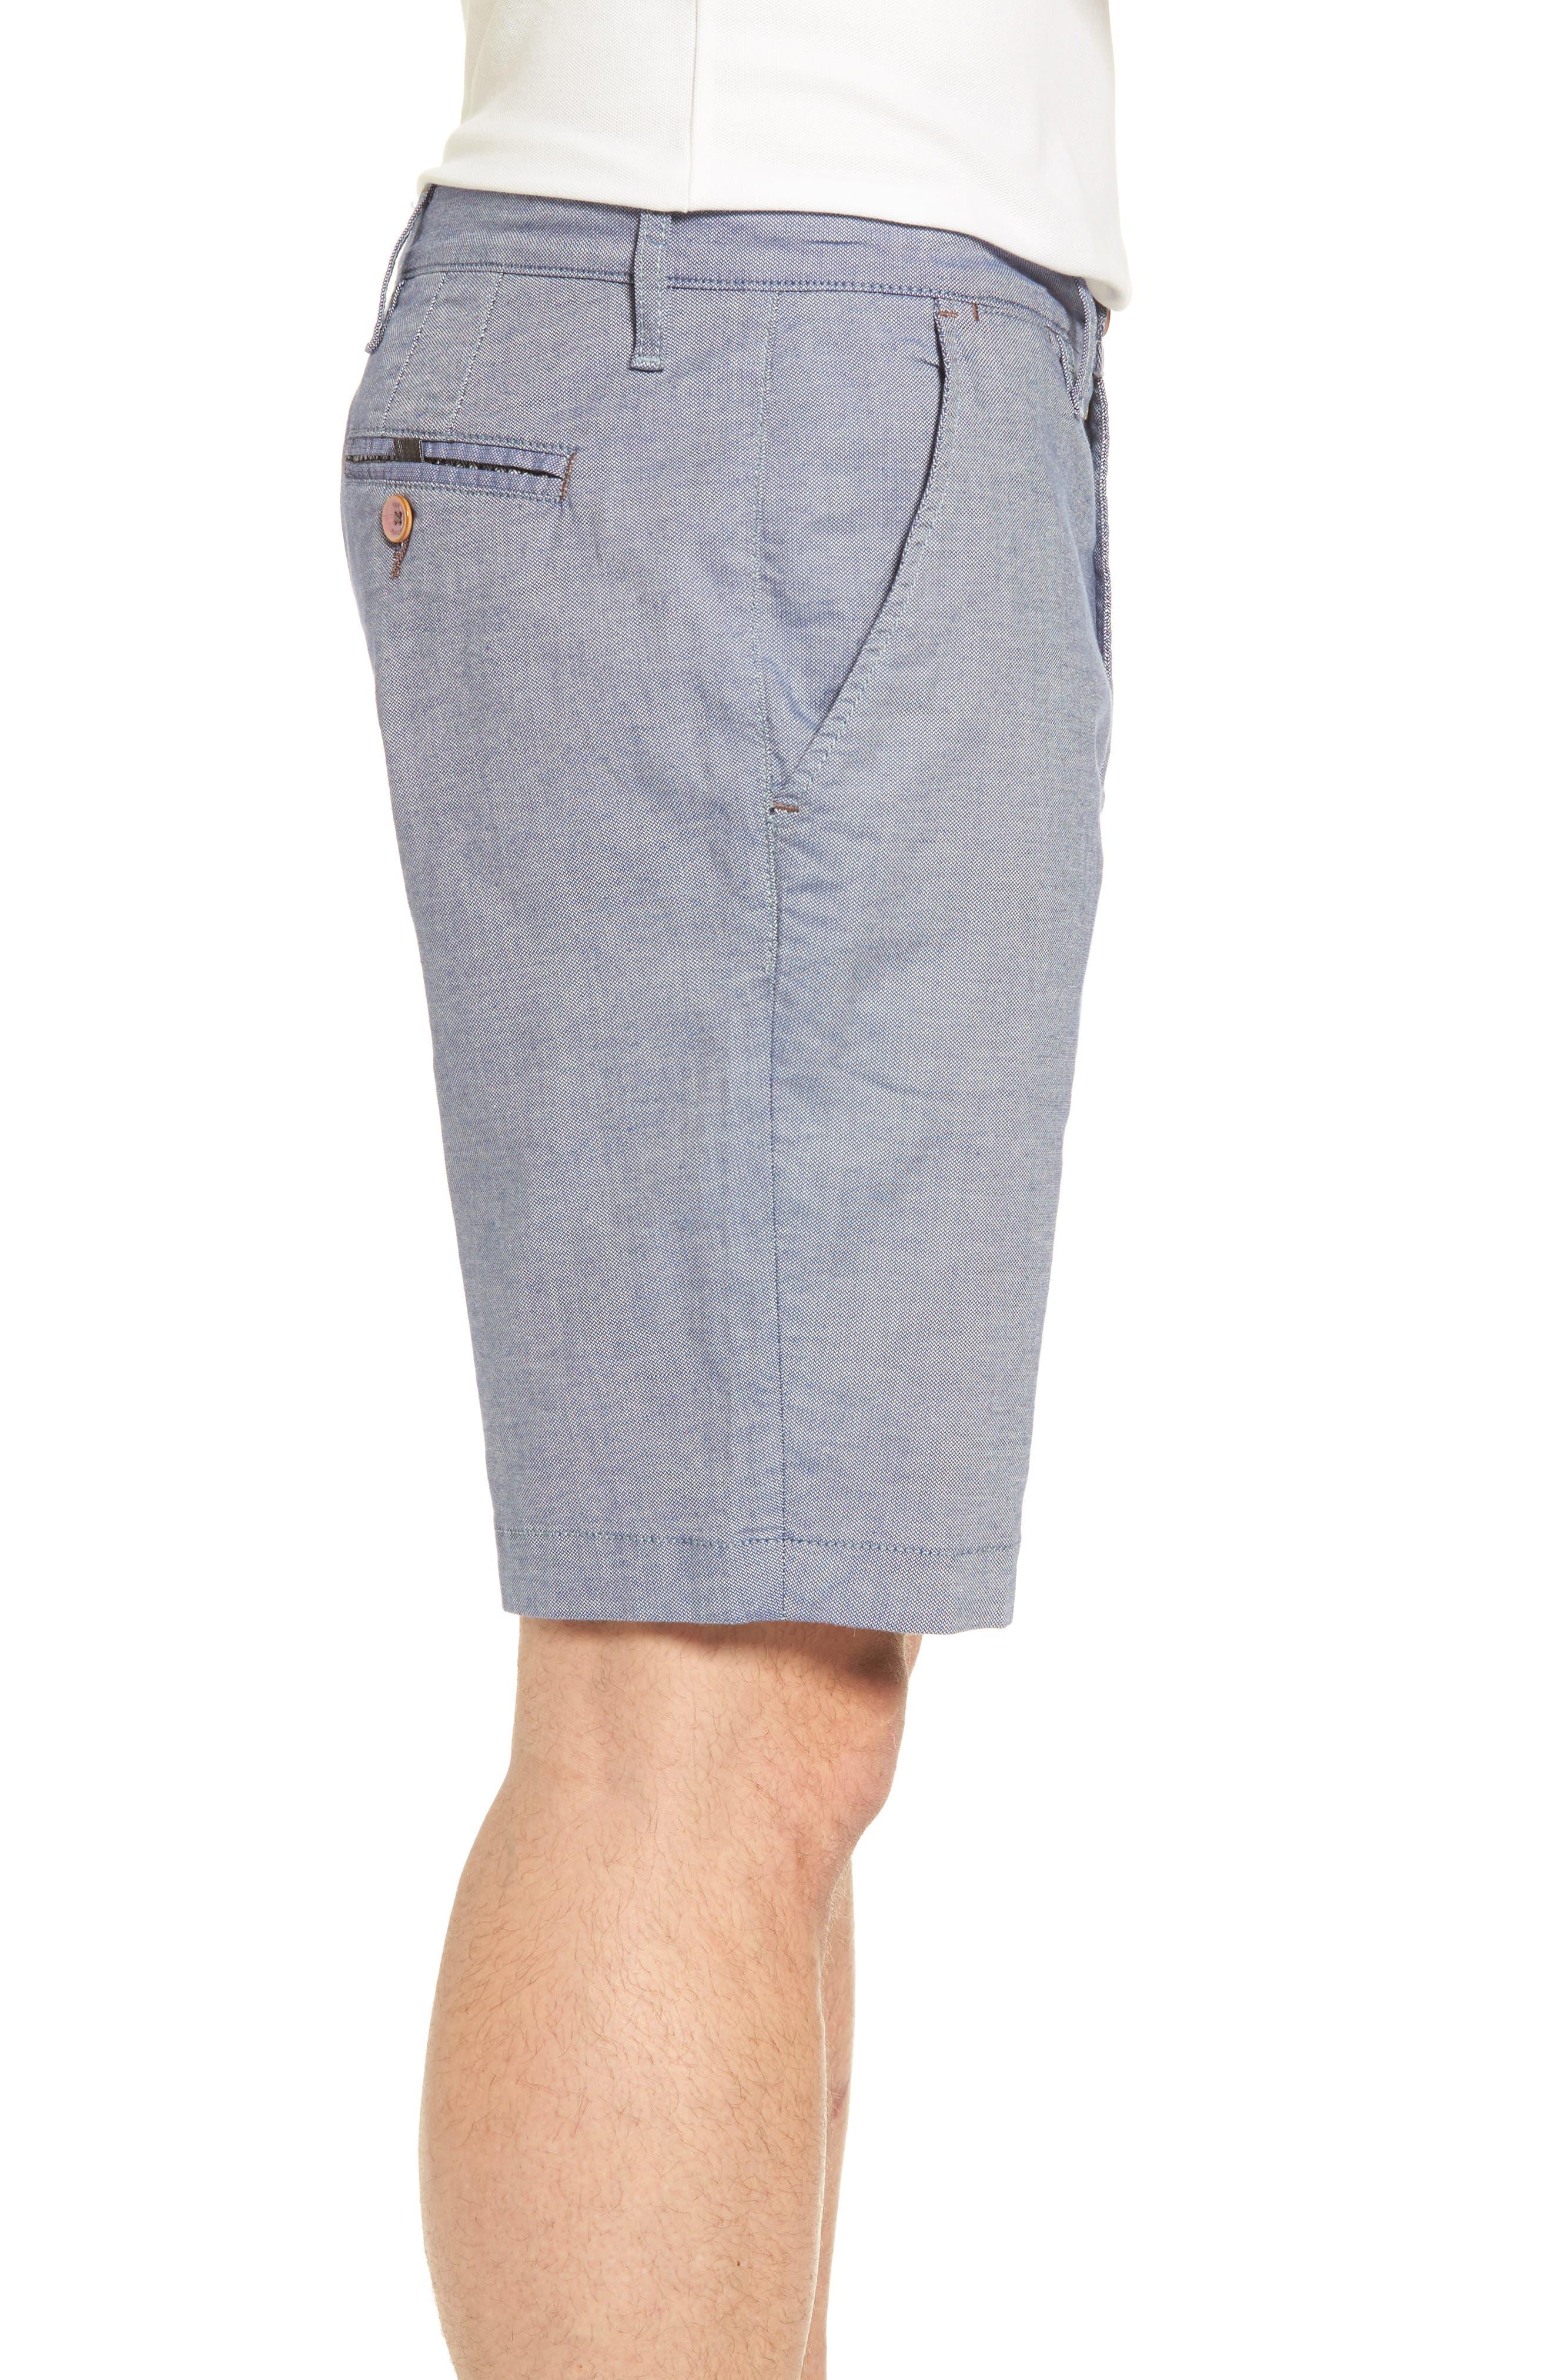 Herbosh Shorts,                             Alternate thumbnail 3, color,                             Navy